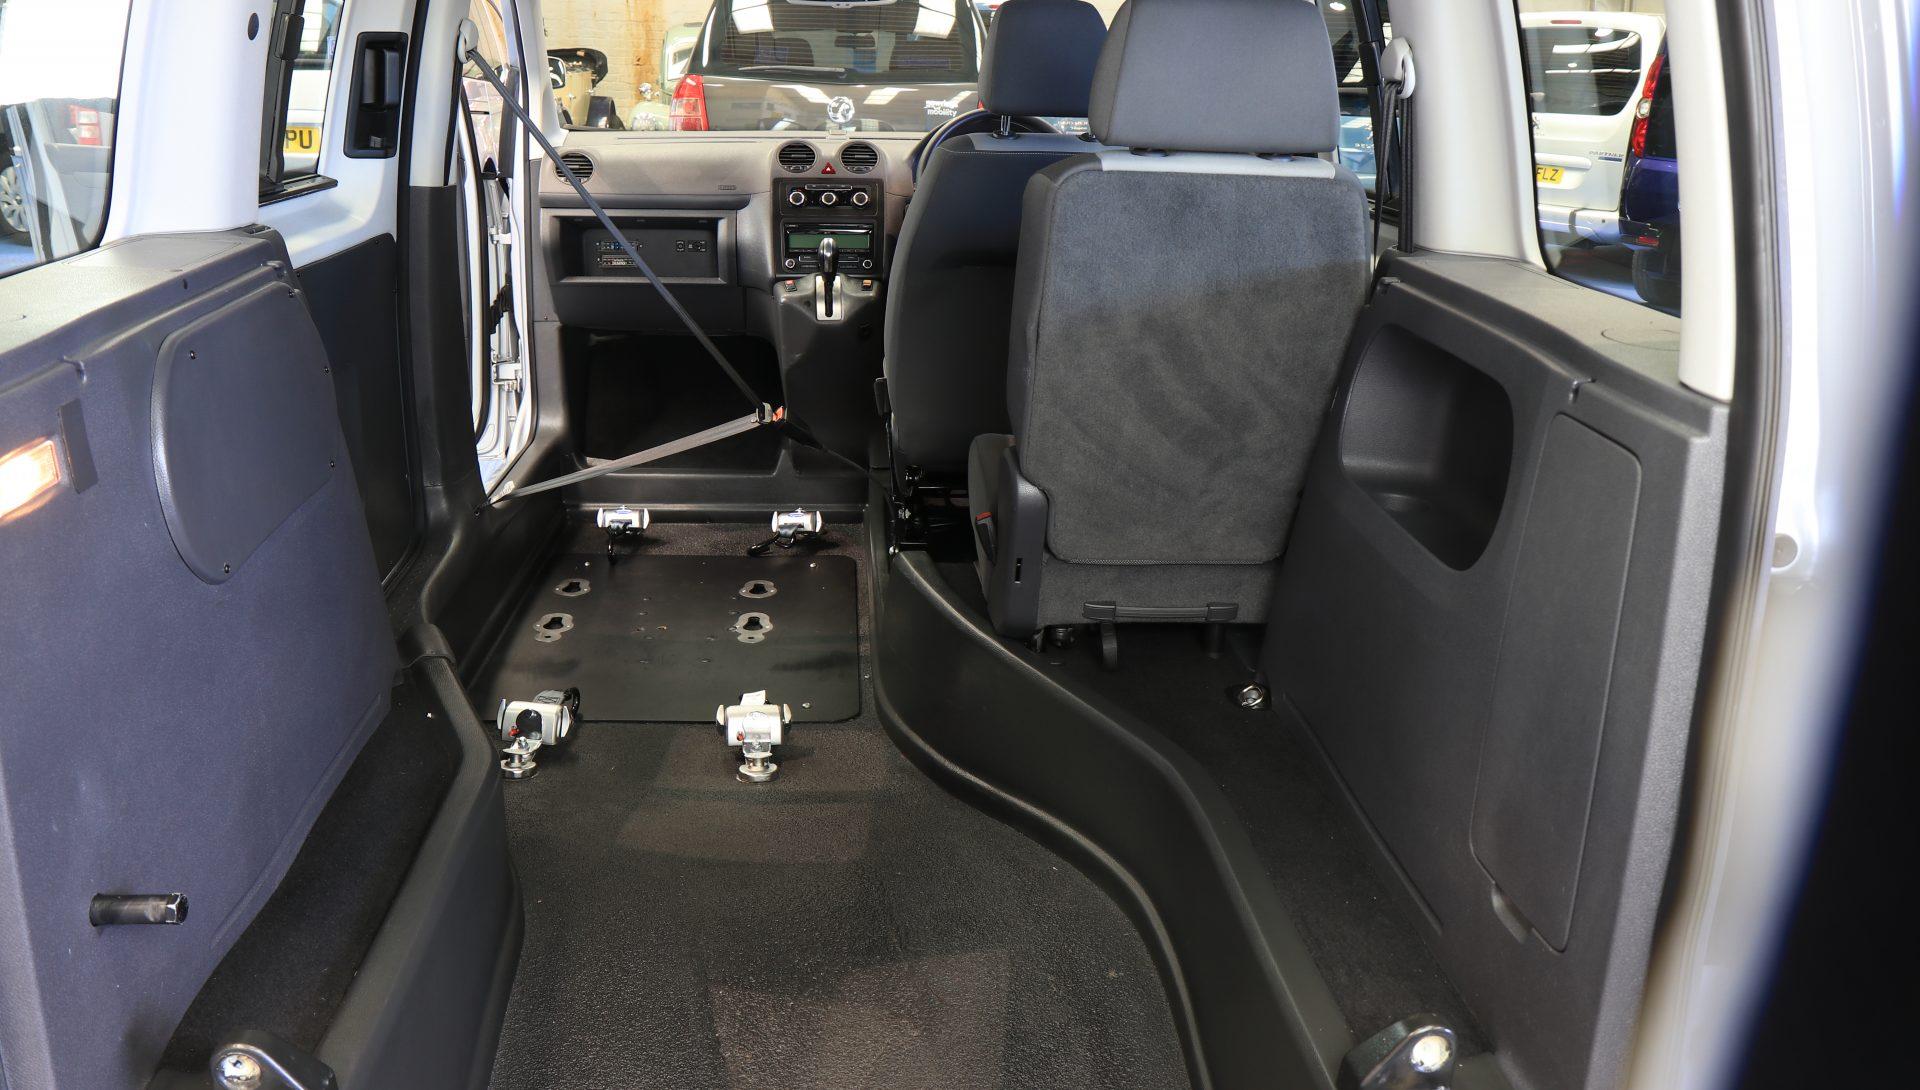 Caddy Wheelchair upfront bv61 vxf